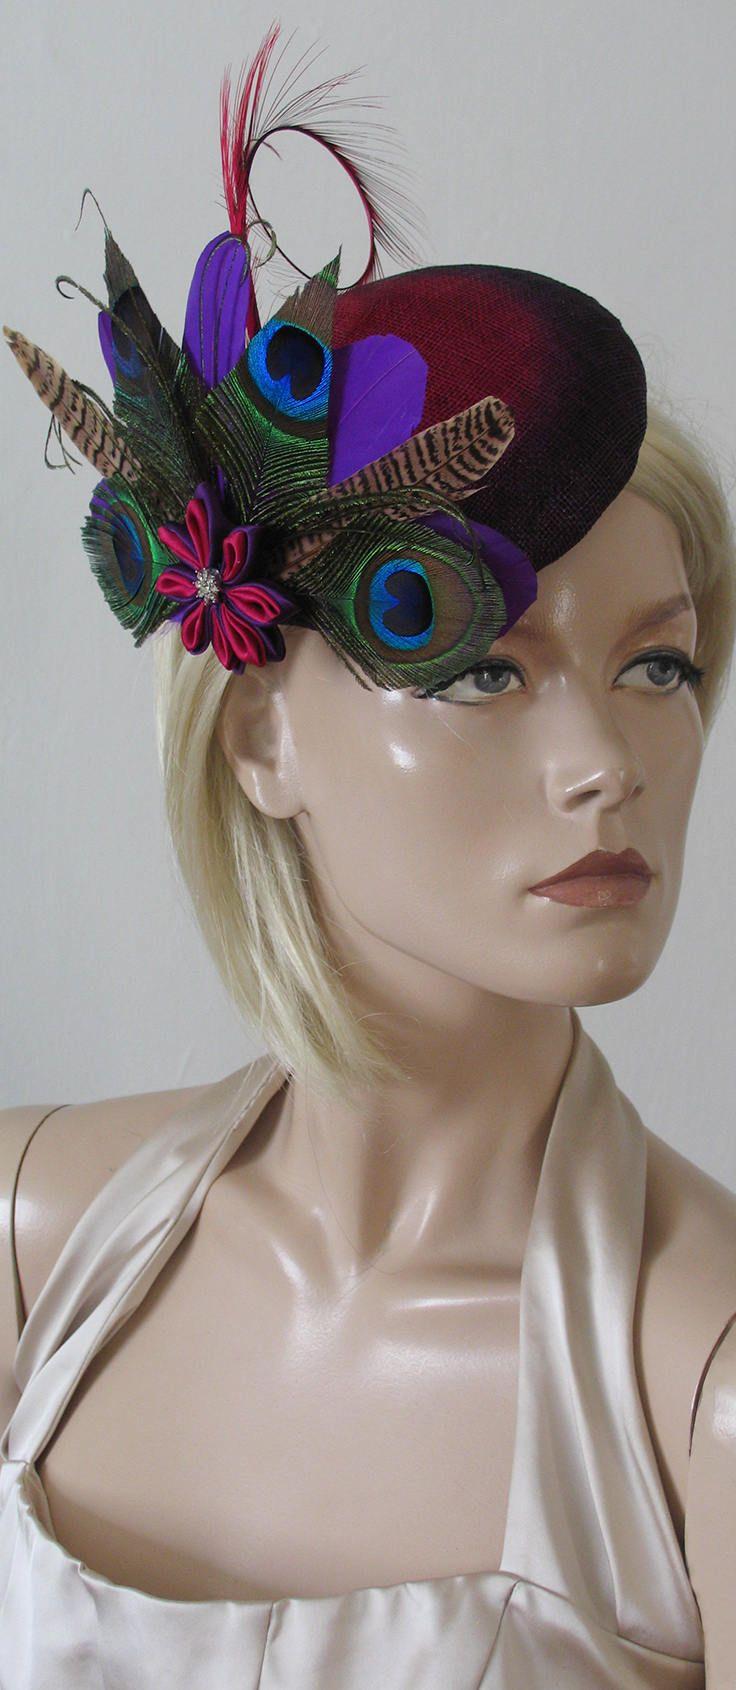 9c6eebc0 Beautiful Hand Made Headpiece Fascinator called